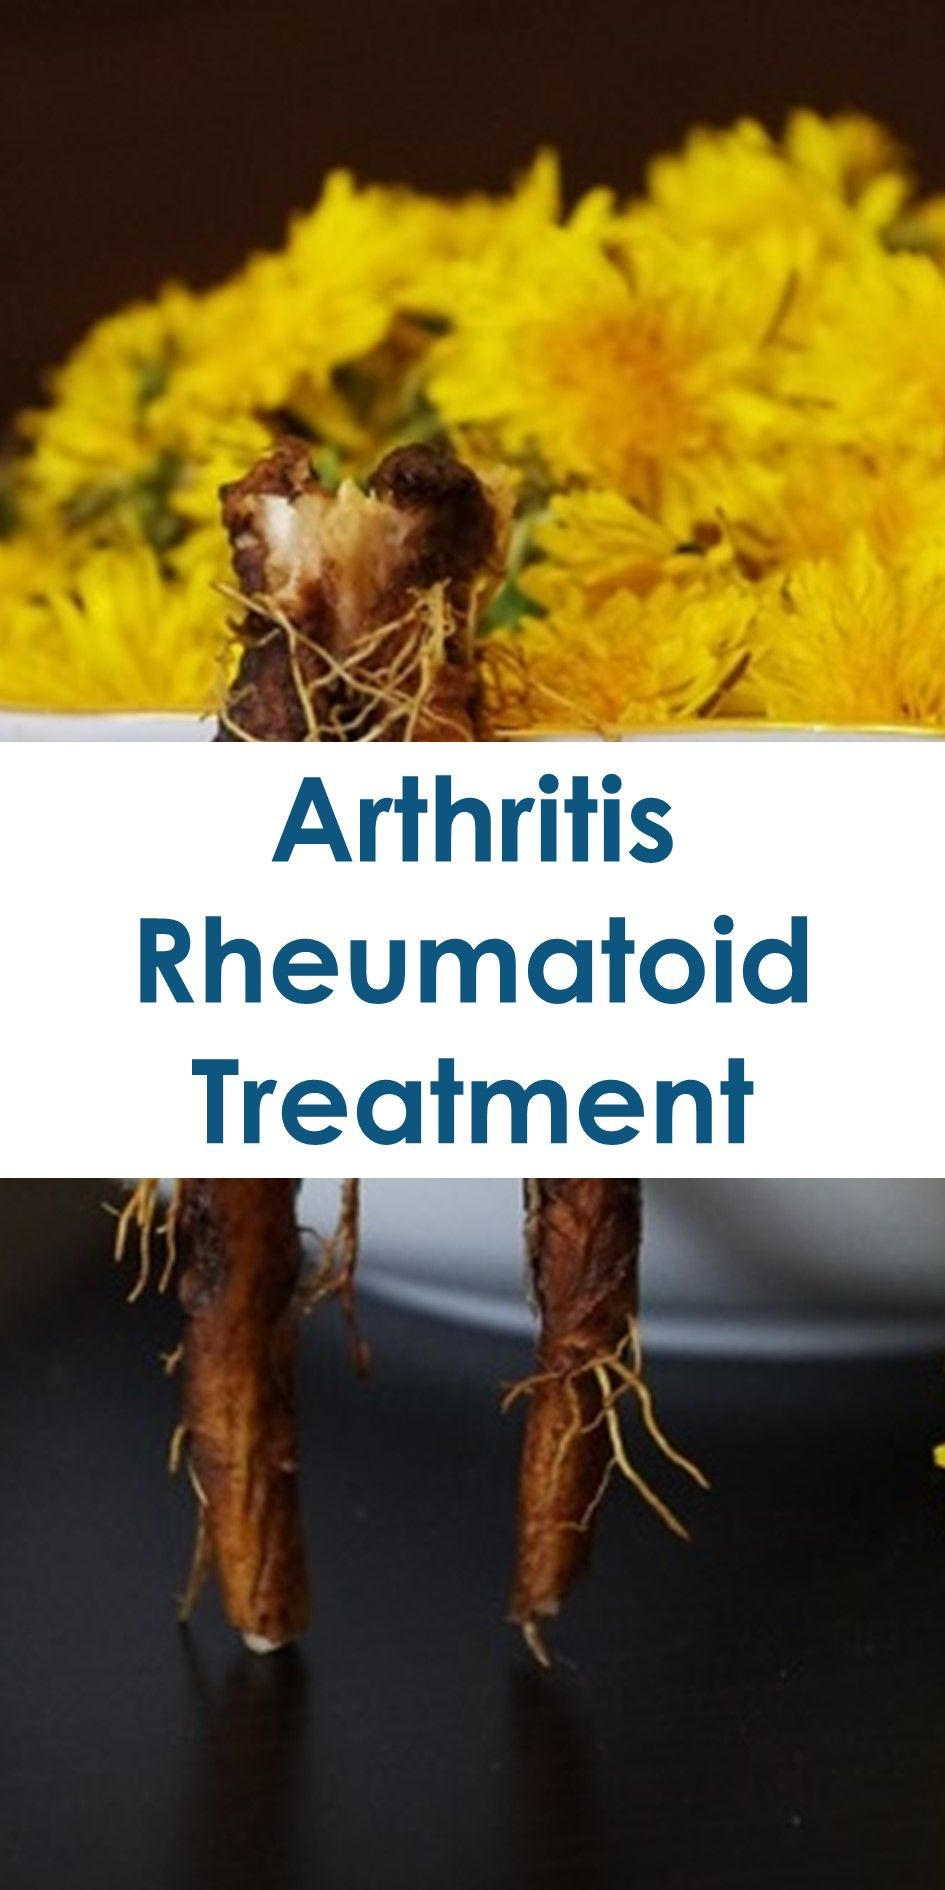 5 Home Remedies for Rheumatoid Arthritis